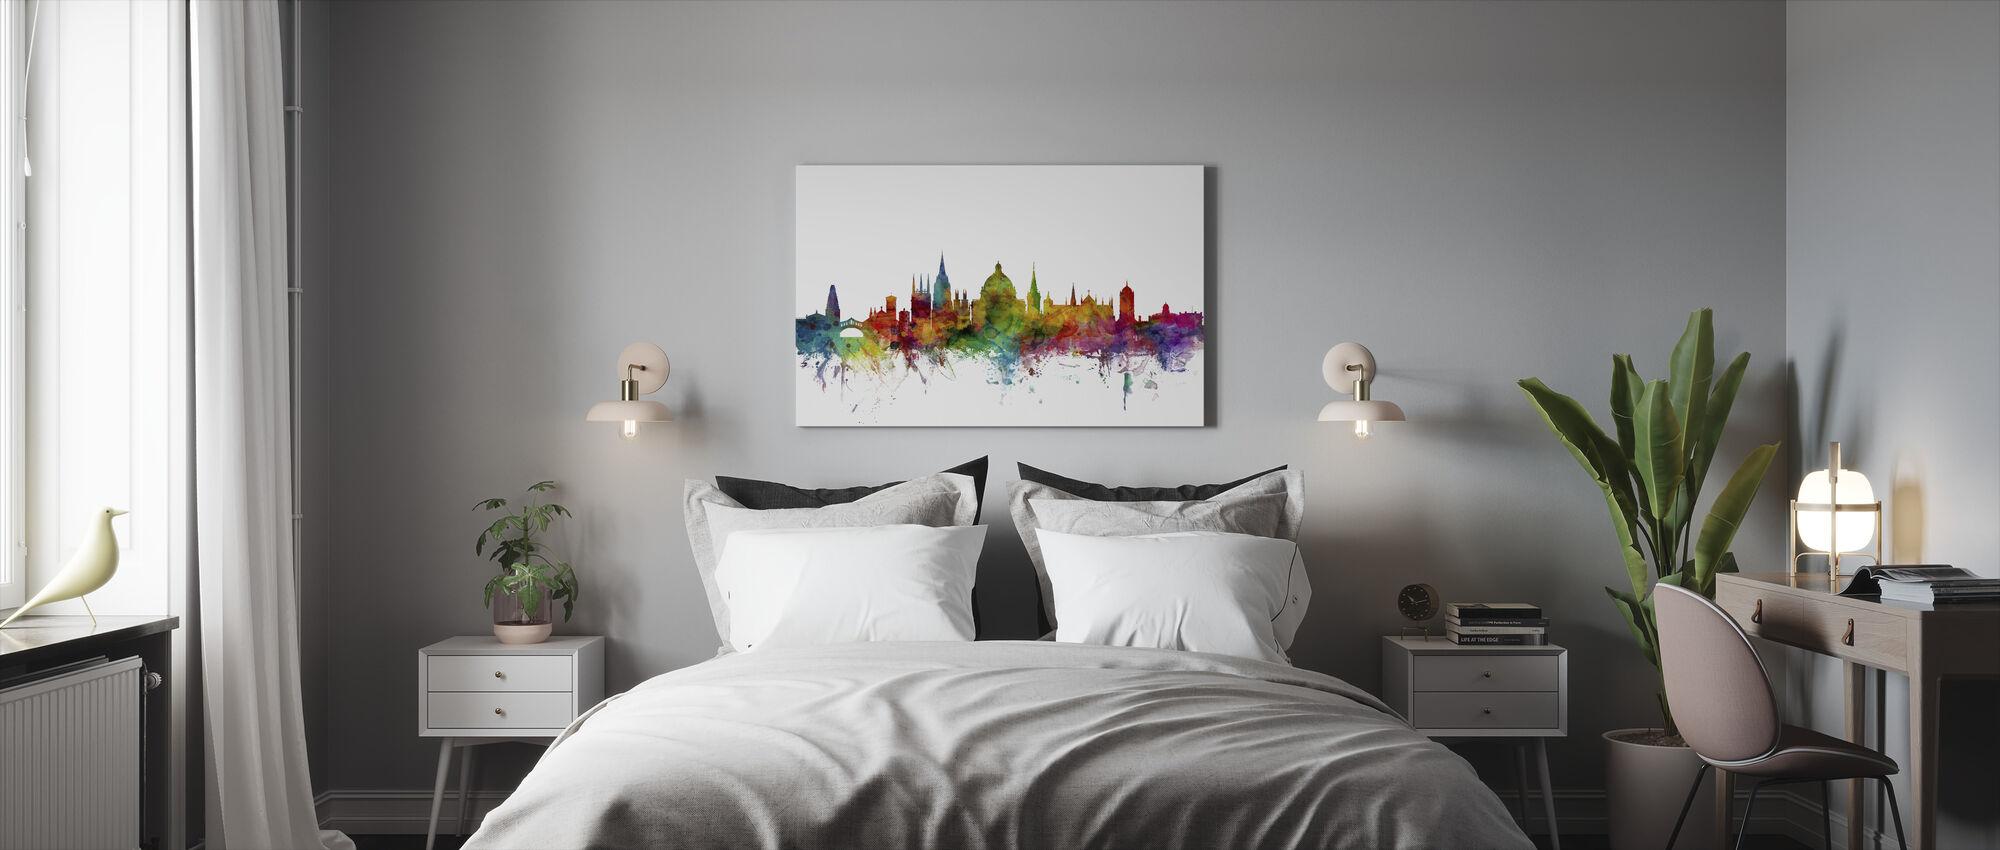 Oxford Skyline - Canvas print - Bedroom